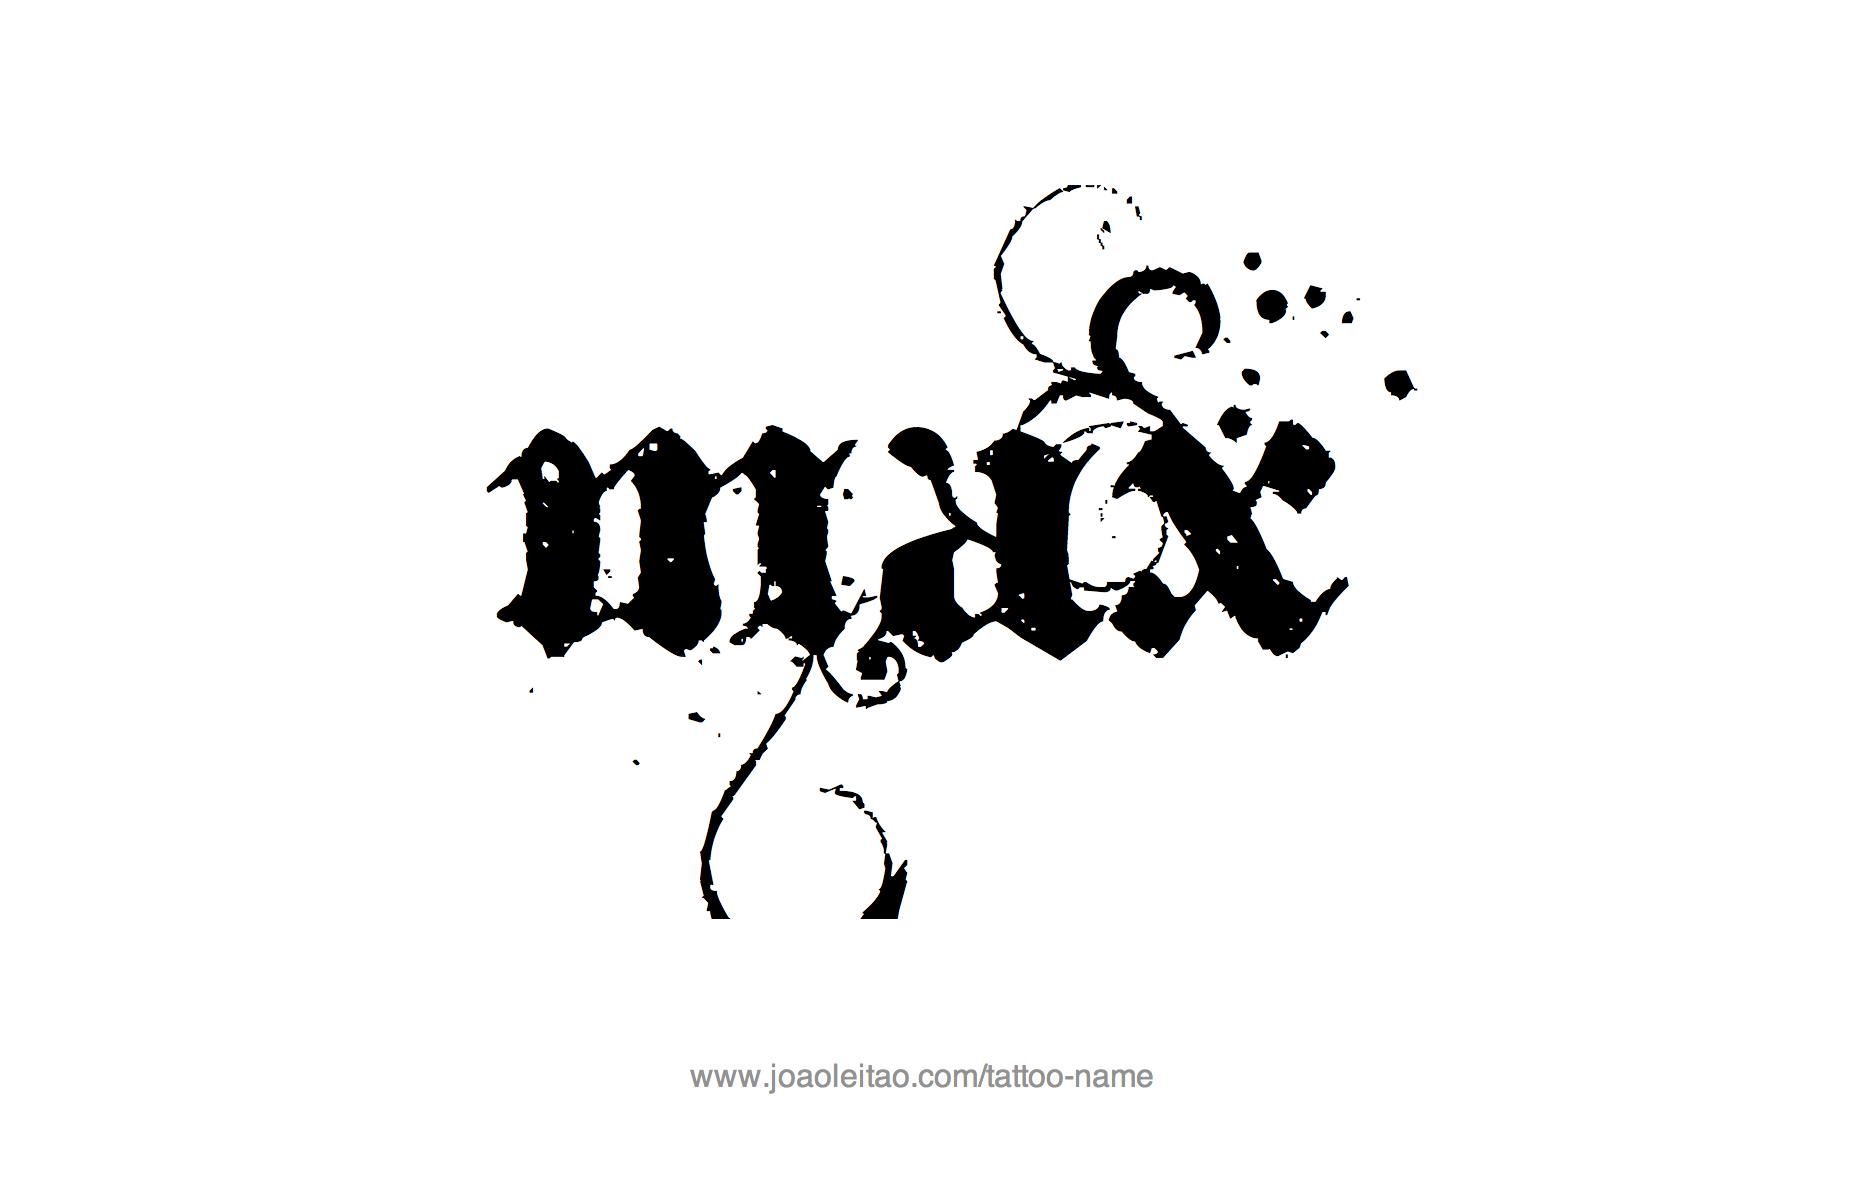 Tattoo Design Name Max